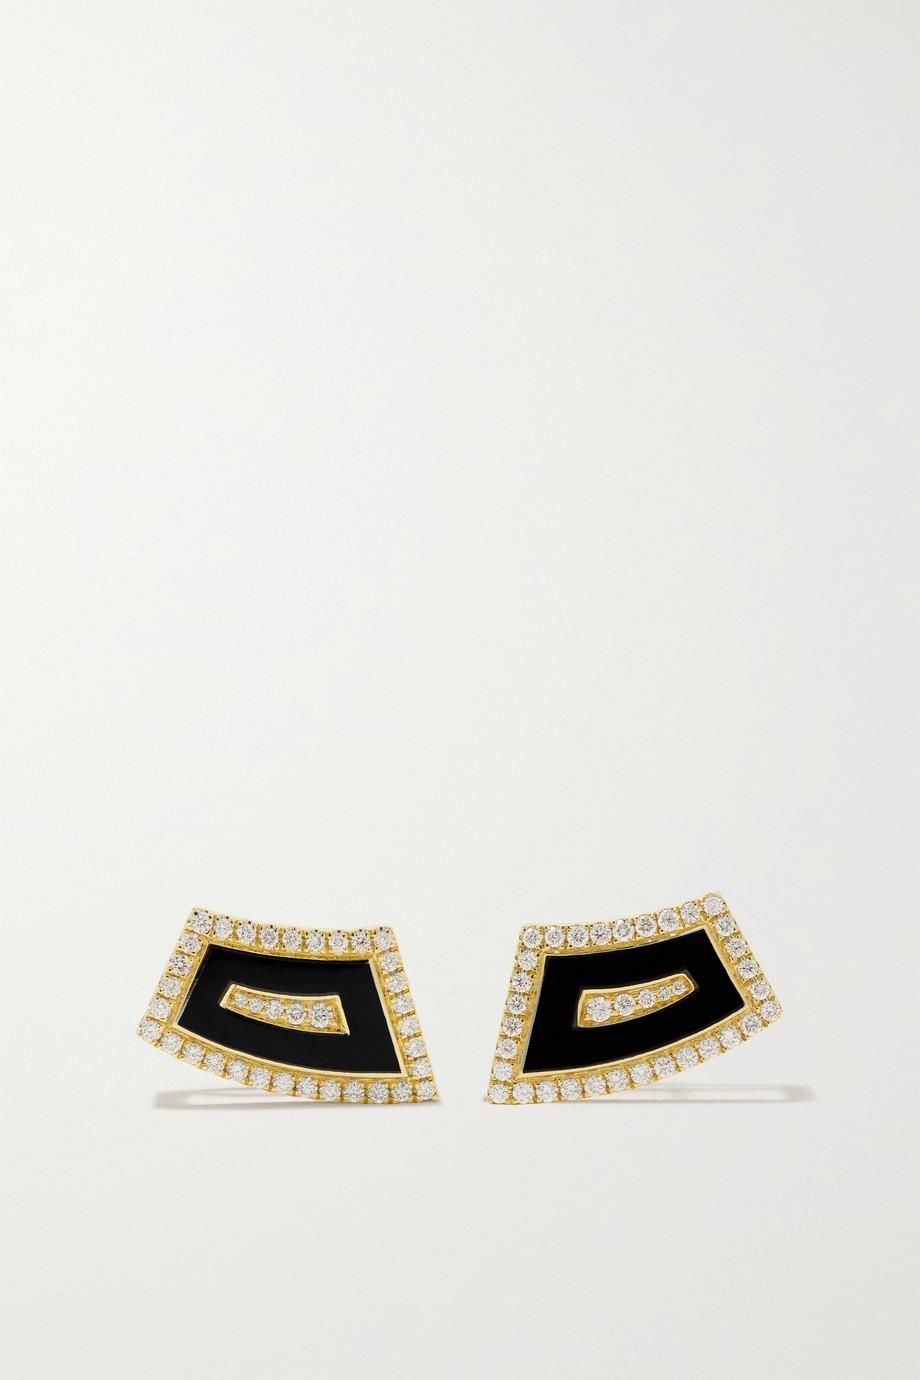 State Property Tabei 18-karat gold, enamel and diamond earrings